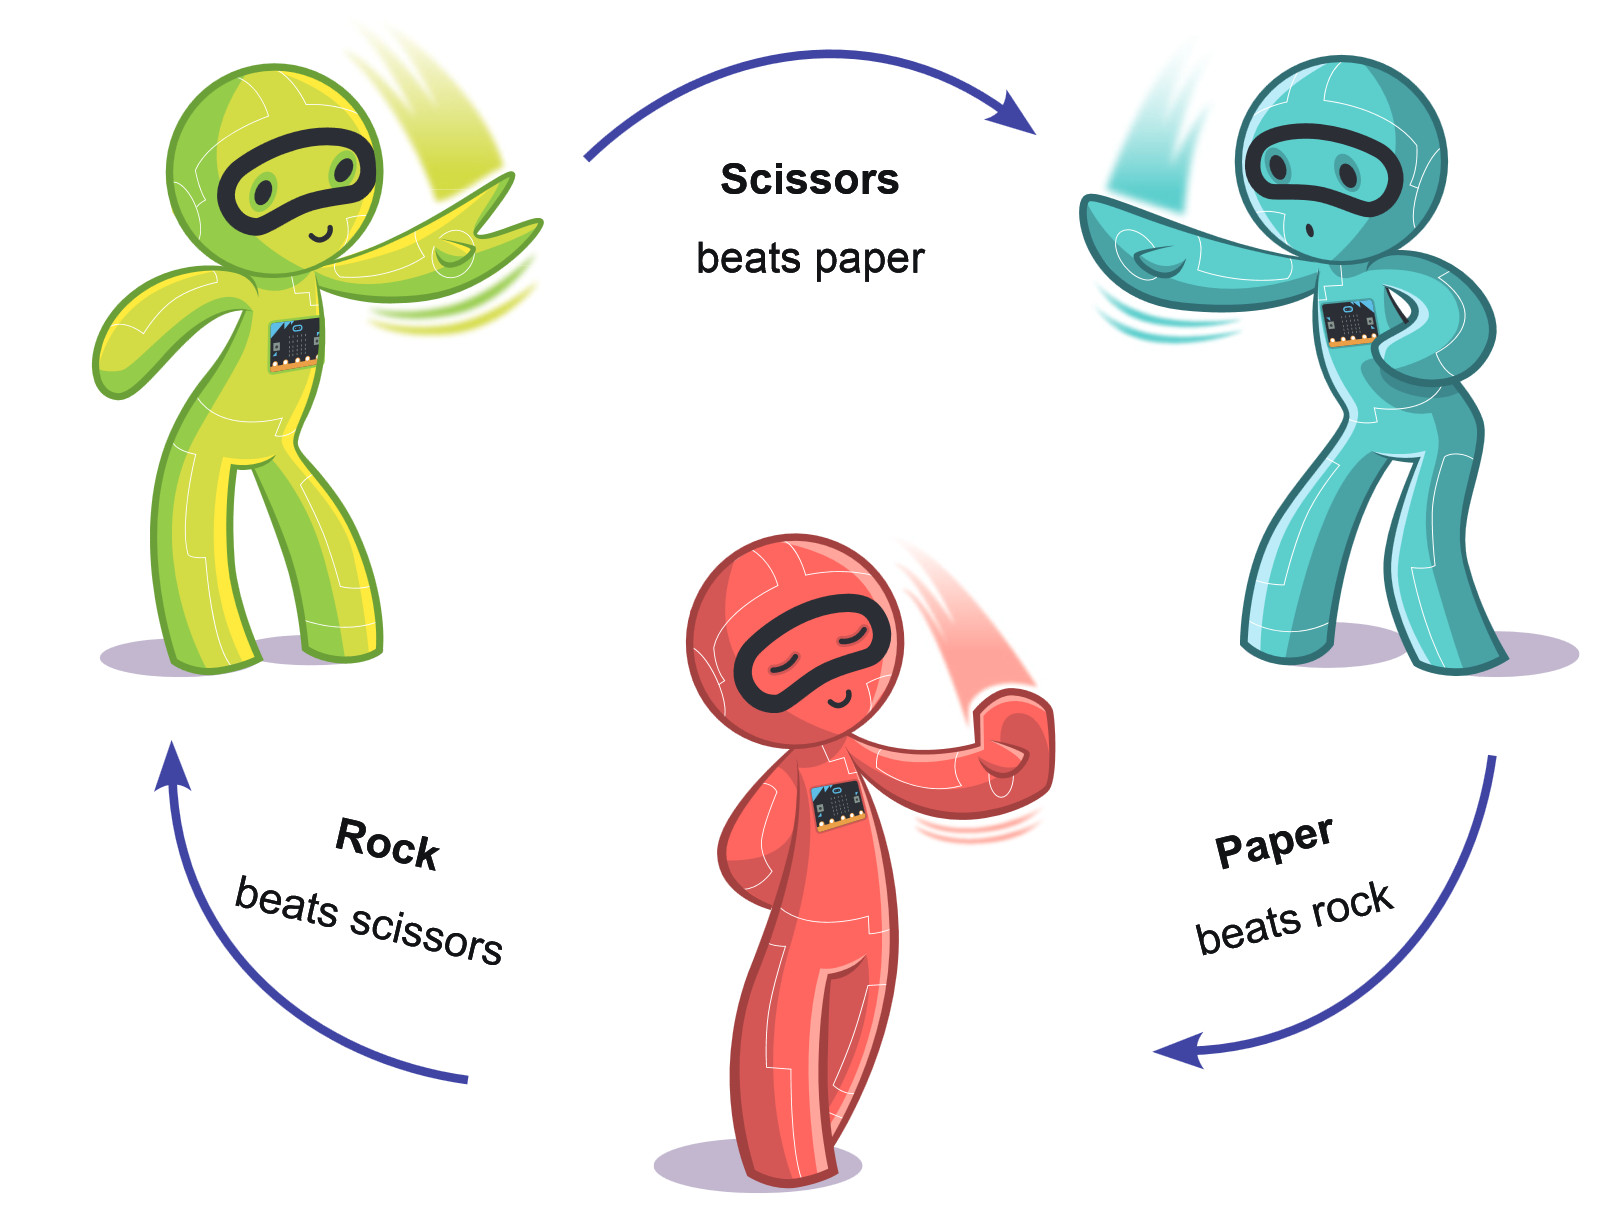 bluefruit___ble_microbit-network-book-rock-paper-scissors-threecharacterrules-hires-43.jpg